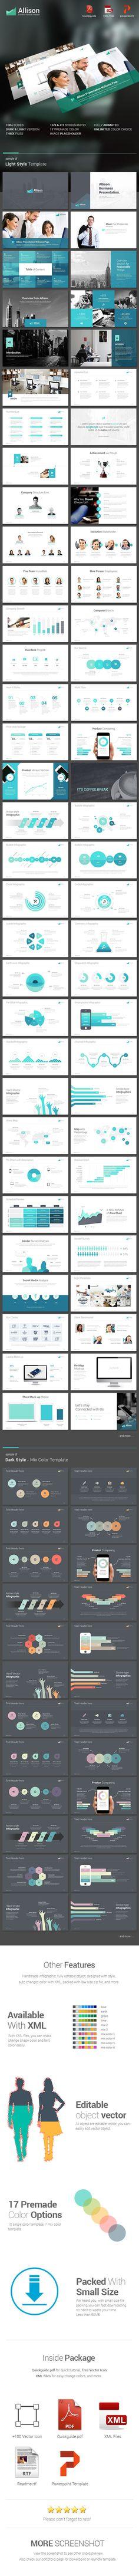 Allison - Creative Powerpoint Template #design #slides Buy Now: http://graphicriver.net/item/allison-creative-powerpoint-template/12925875?ref=ksioks